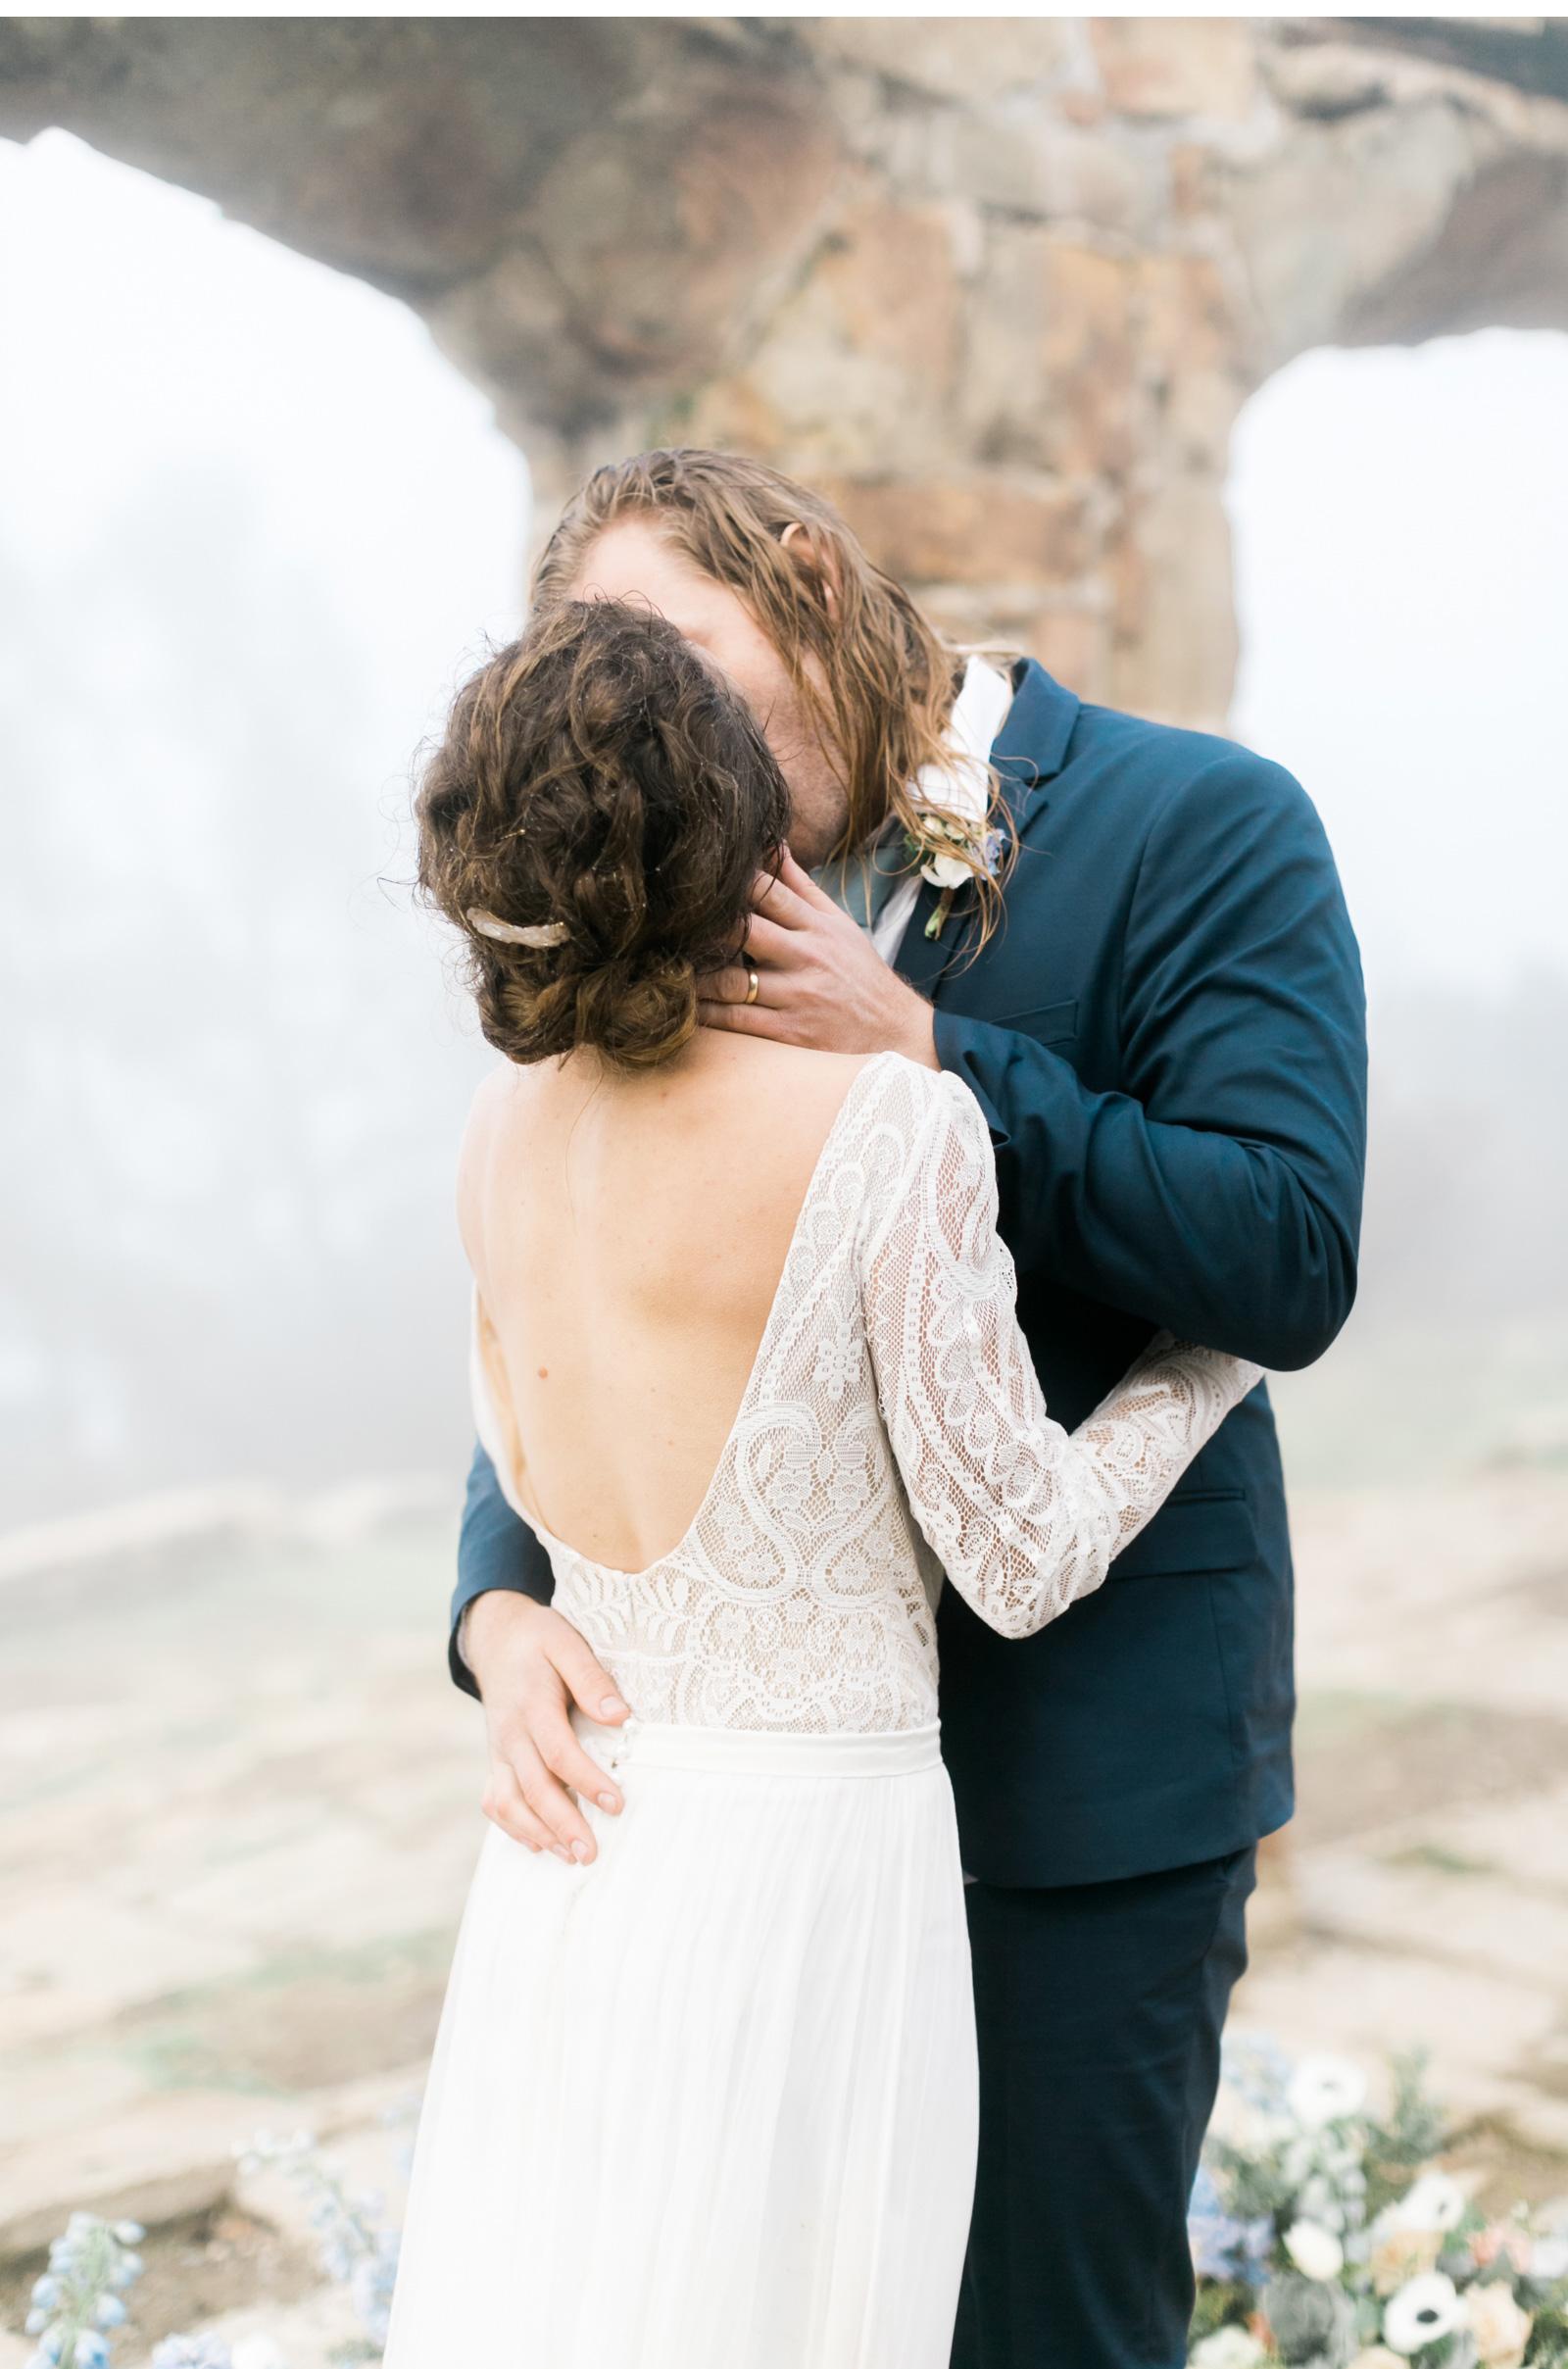 San-Luis-Obispo-Wedding-Fine-Art-Style-Me-Pretty-Natalie-Schutt-Photography_07.jpg